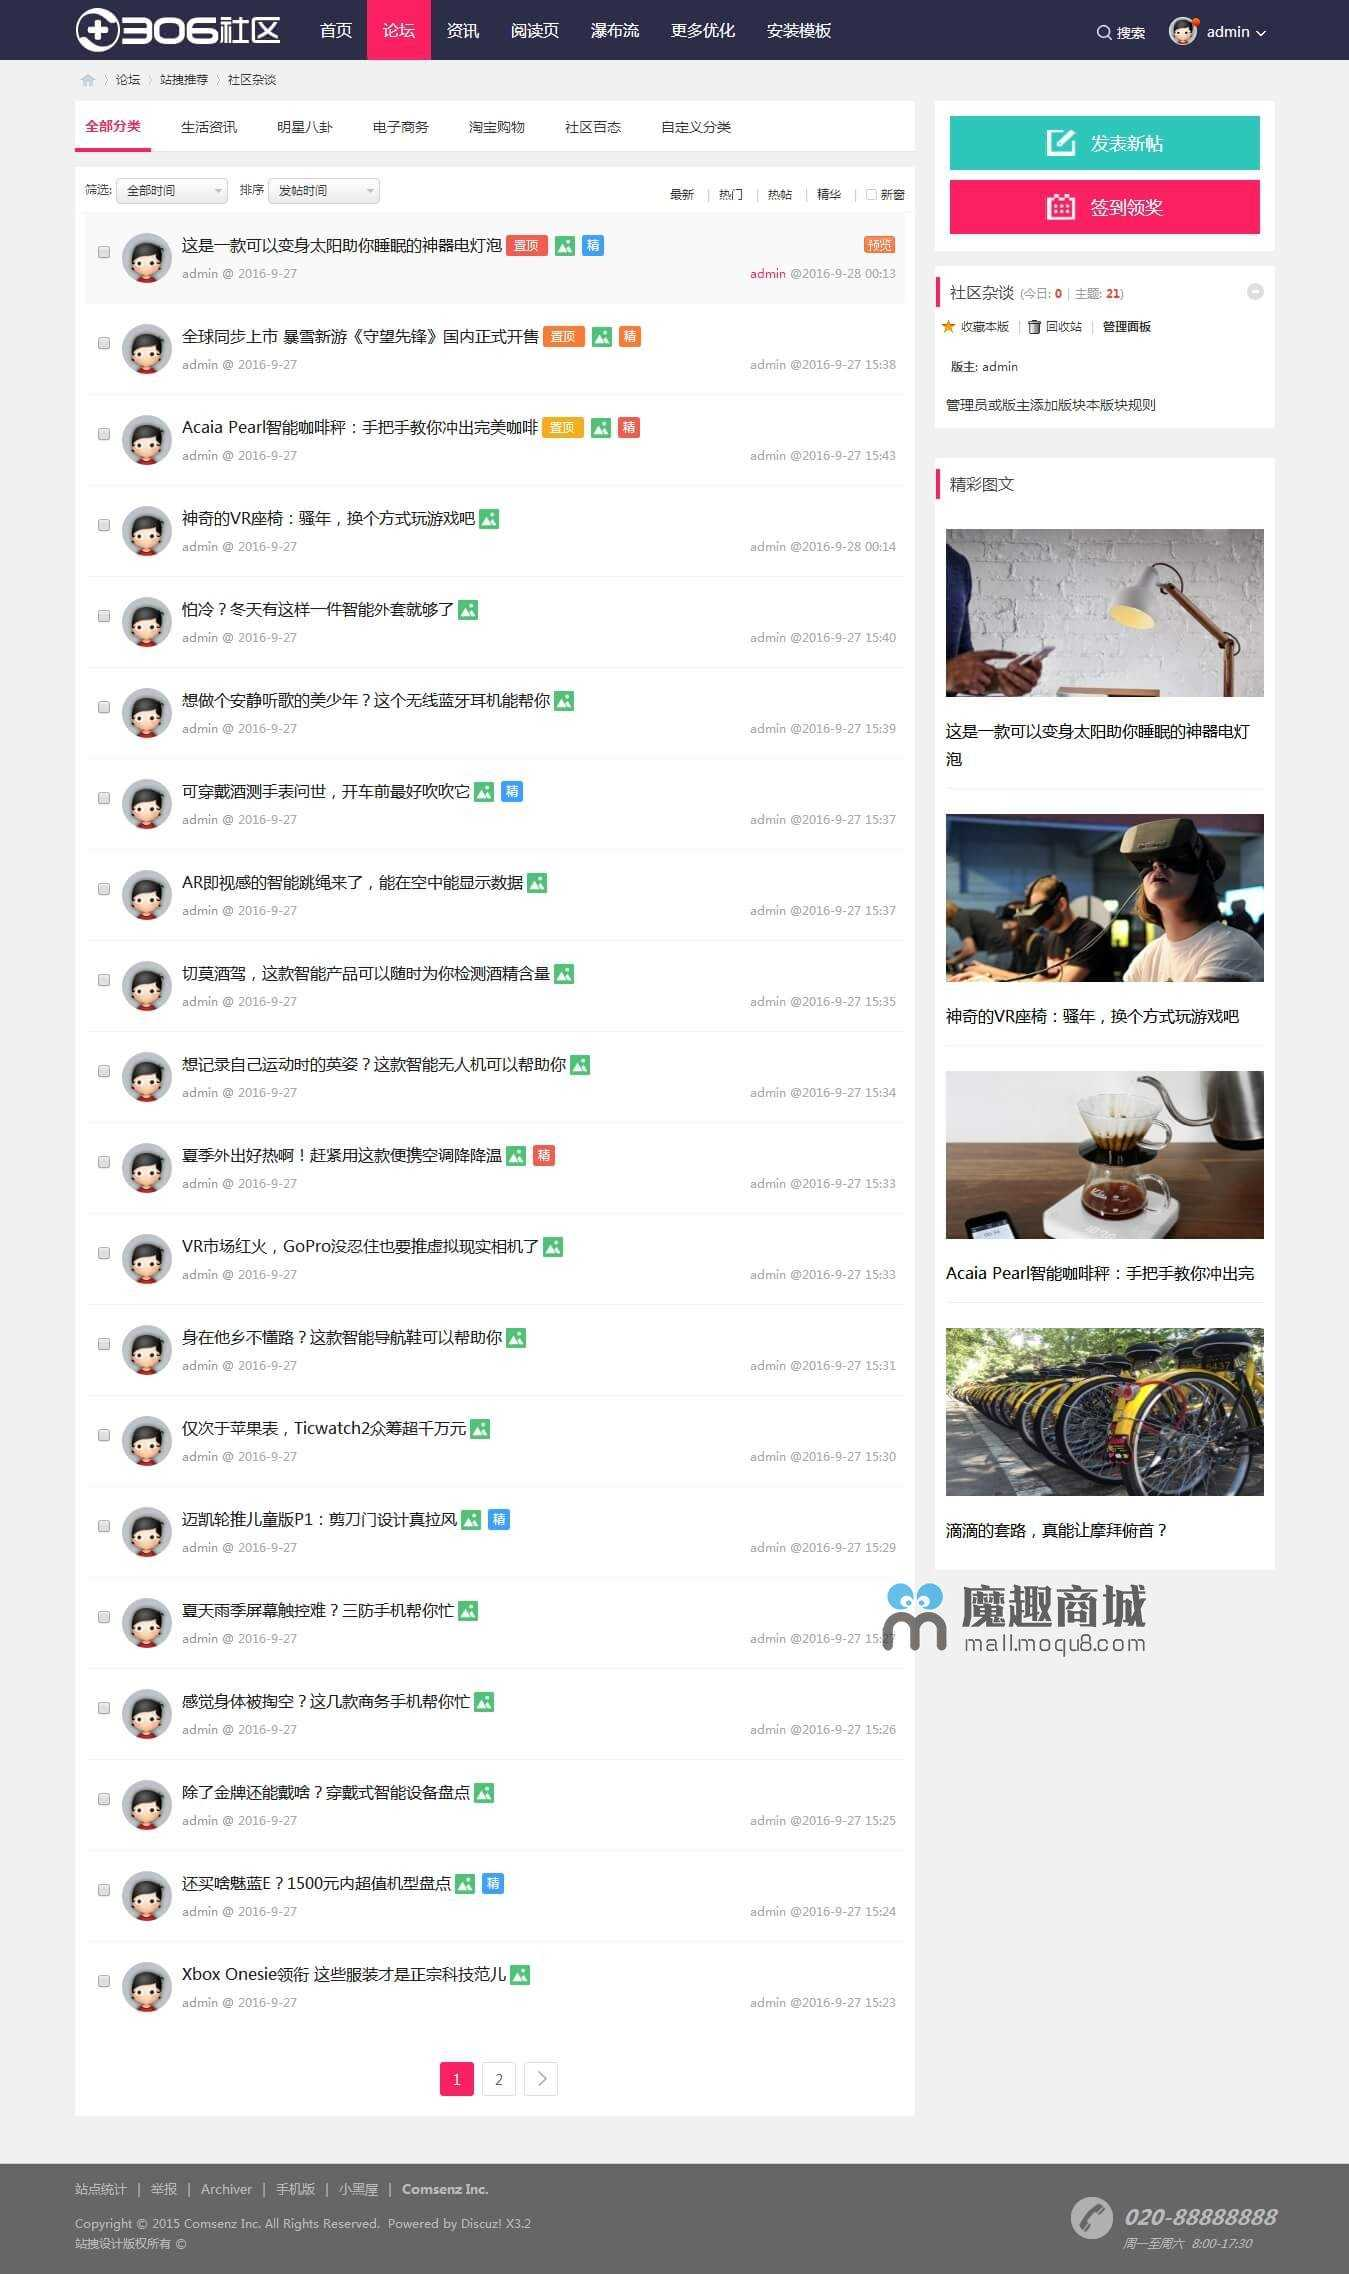 <font color='#0000ff'>魔趣360酷黑网络媒体社区模板</font>